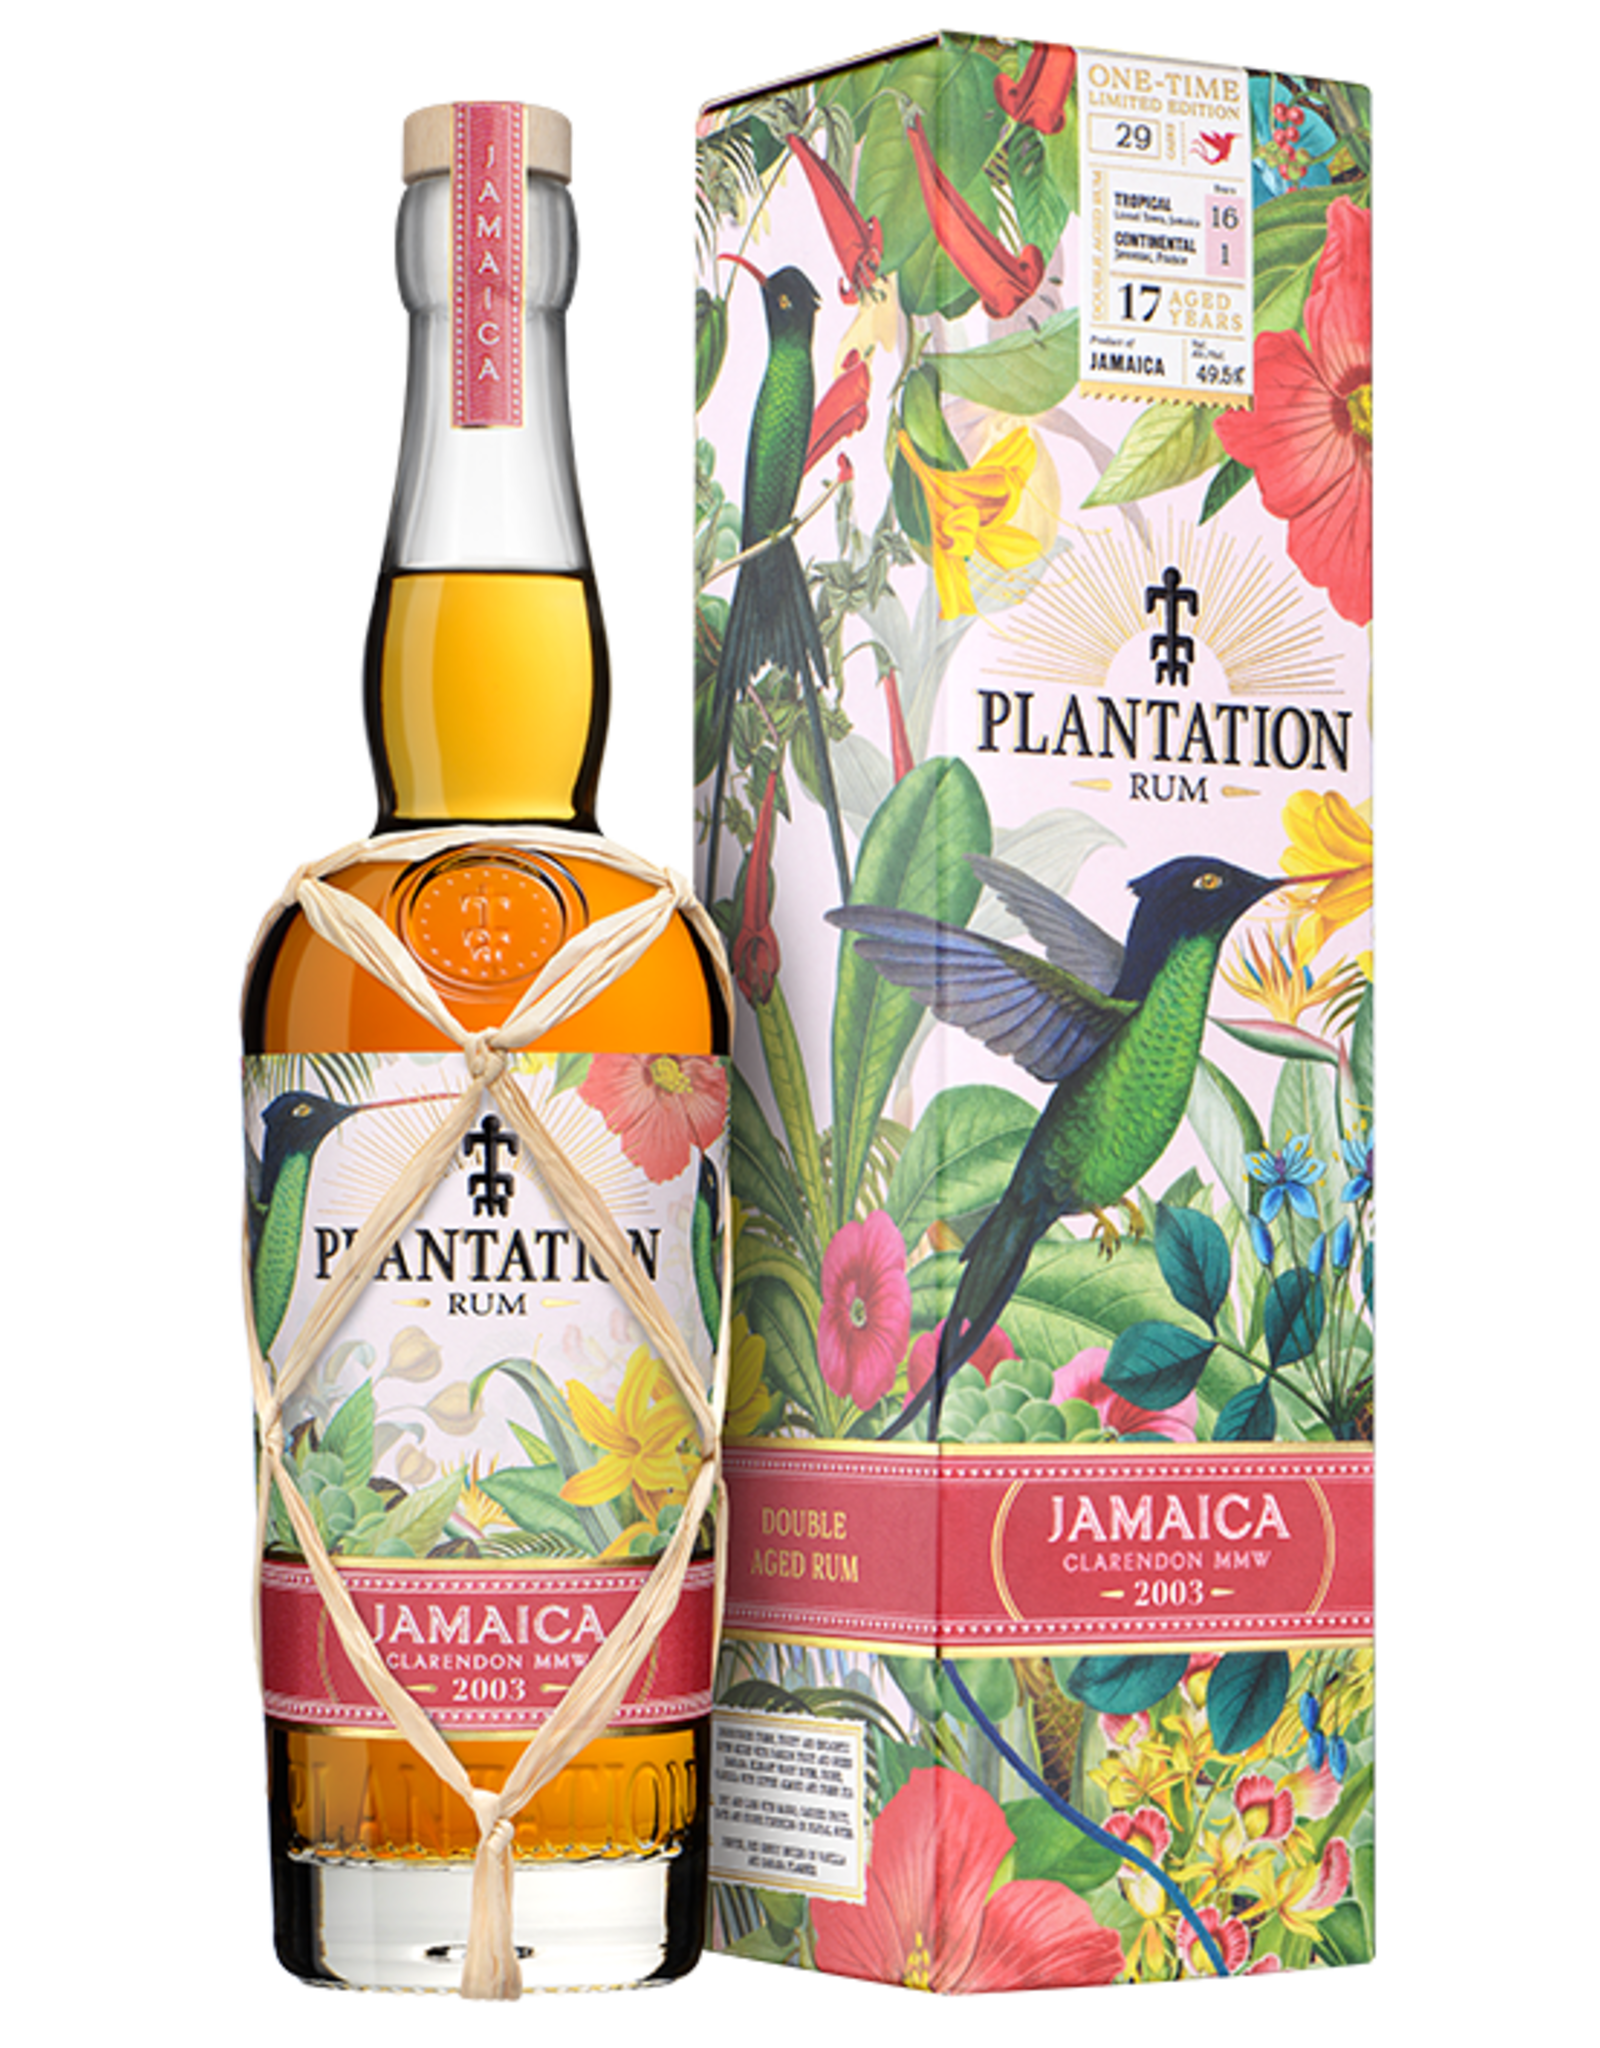 Plantation 2003 Jamaican Rum 16yr Clarendon MMW